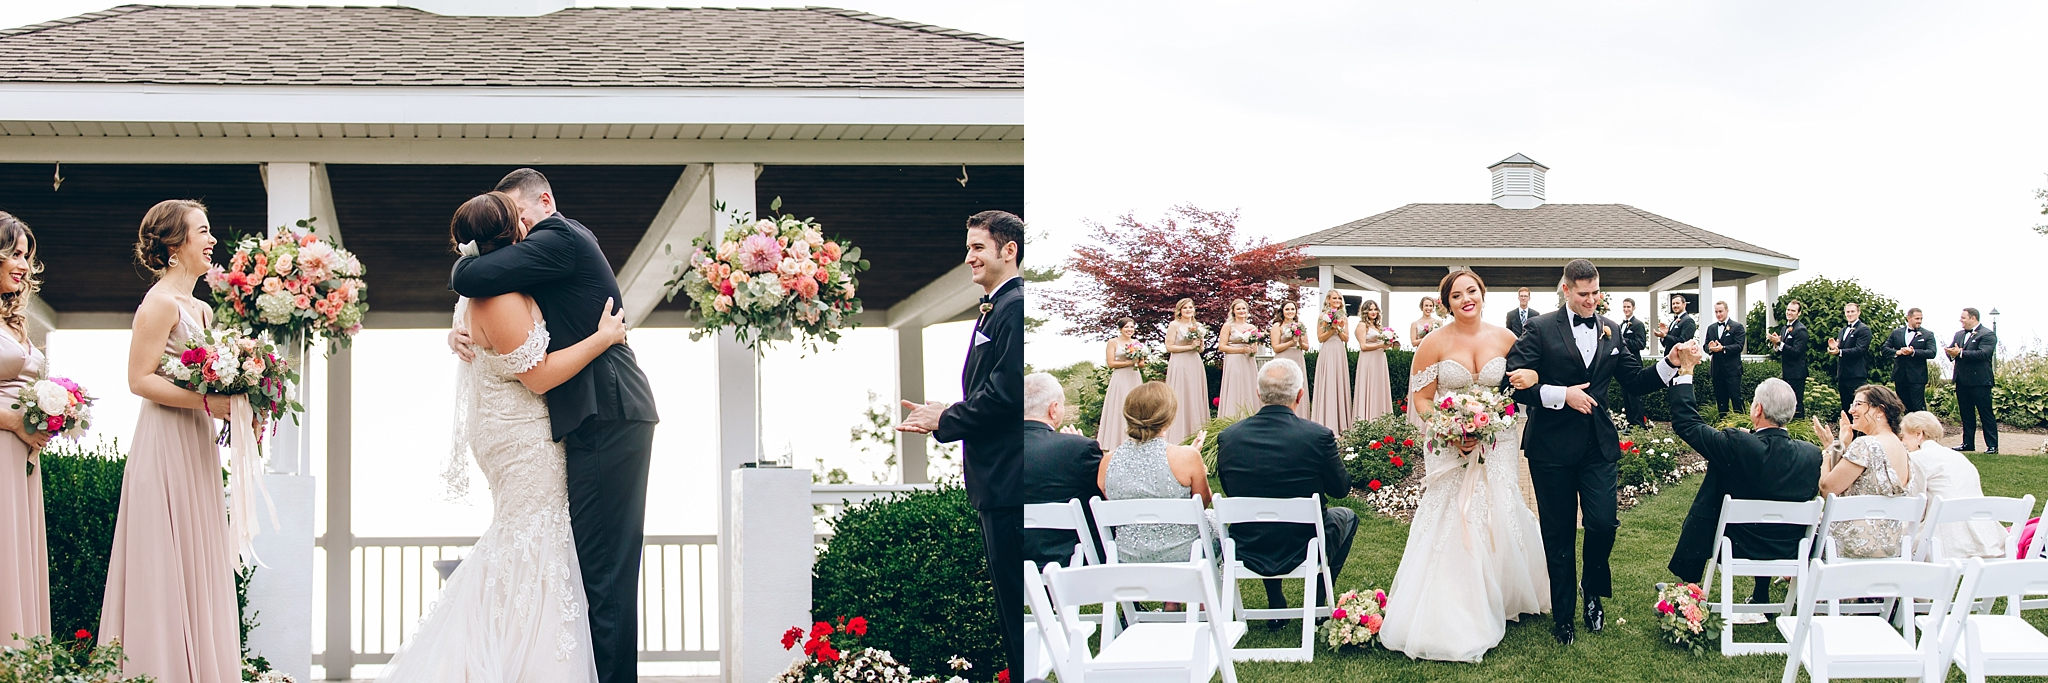 baker-lofts-holland-michigan-wedding-photographer_0359.jpg